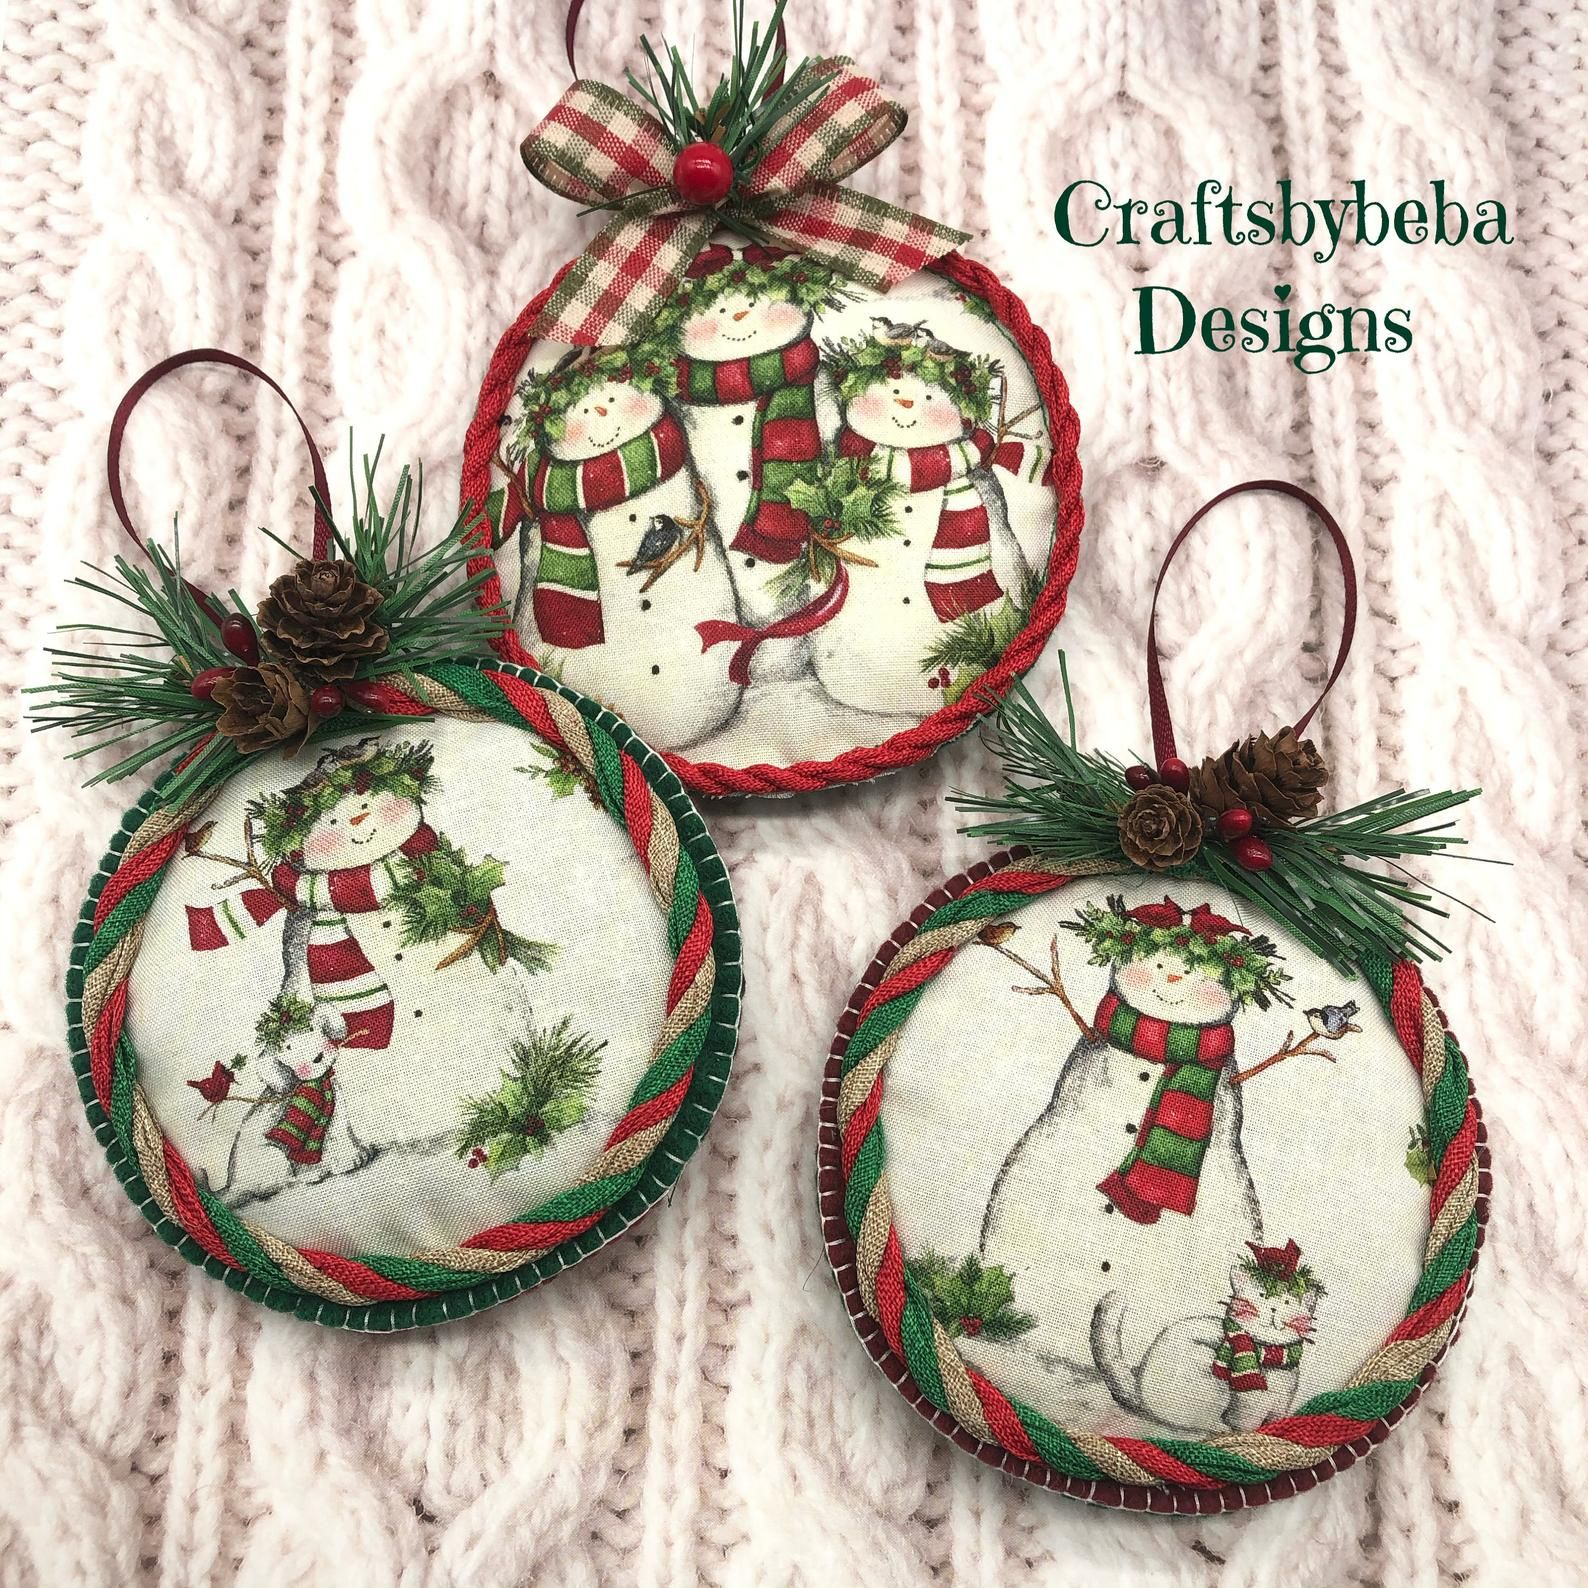 Snowman Handmade Ornaments Set 3 Ornaments Christmas Etsy Christmas Ornament Crafts Fabric Christmas Ornaments Christmas Ornaments